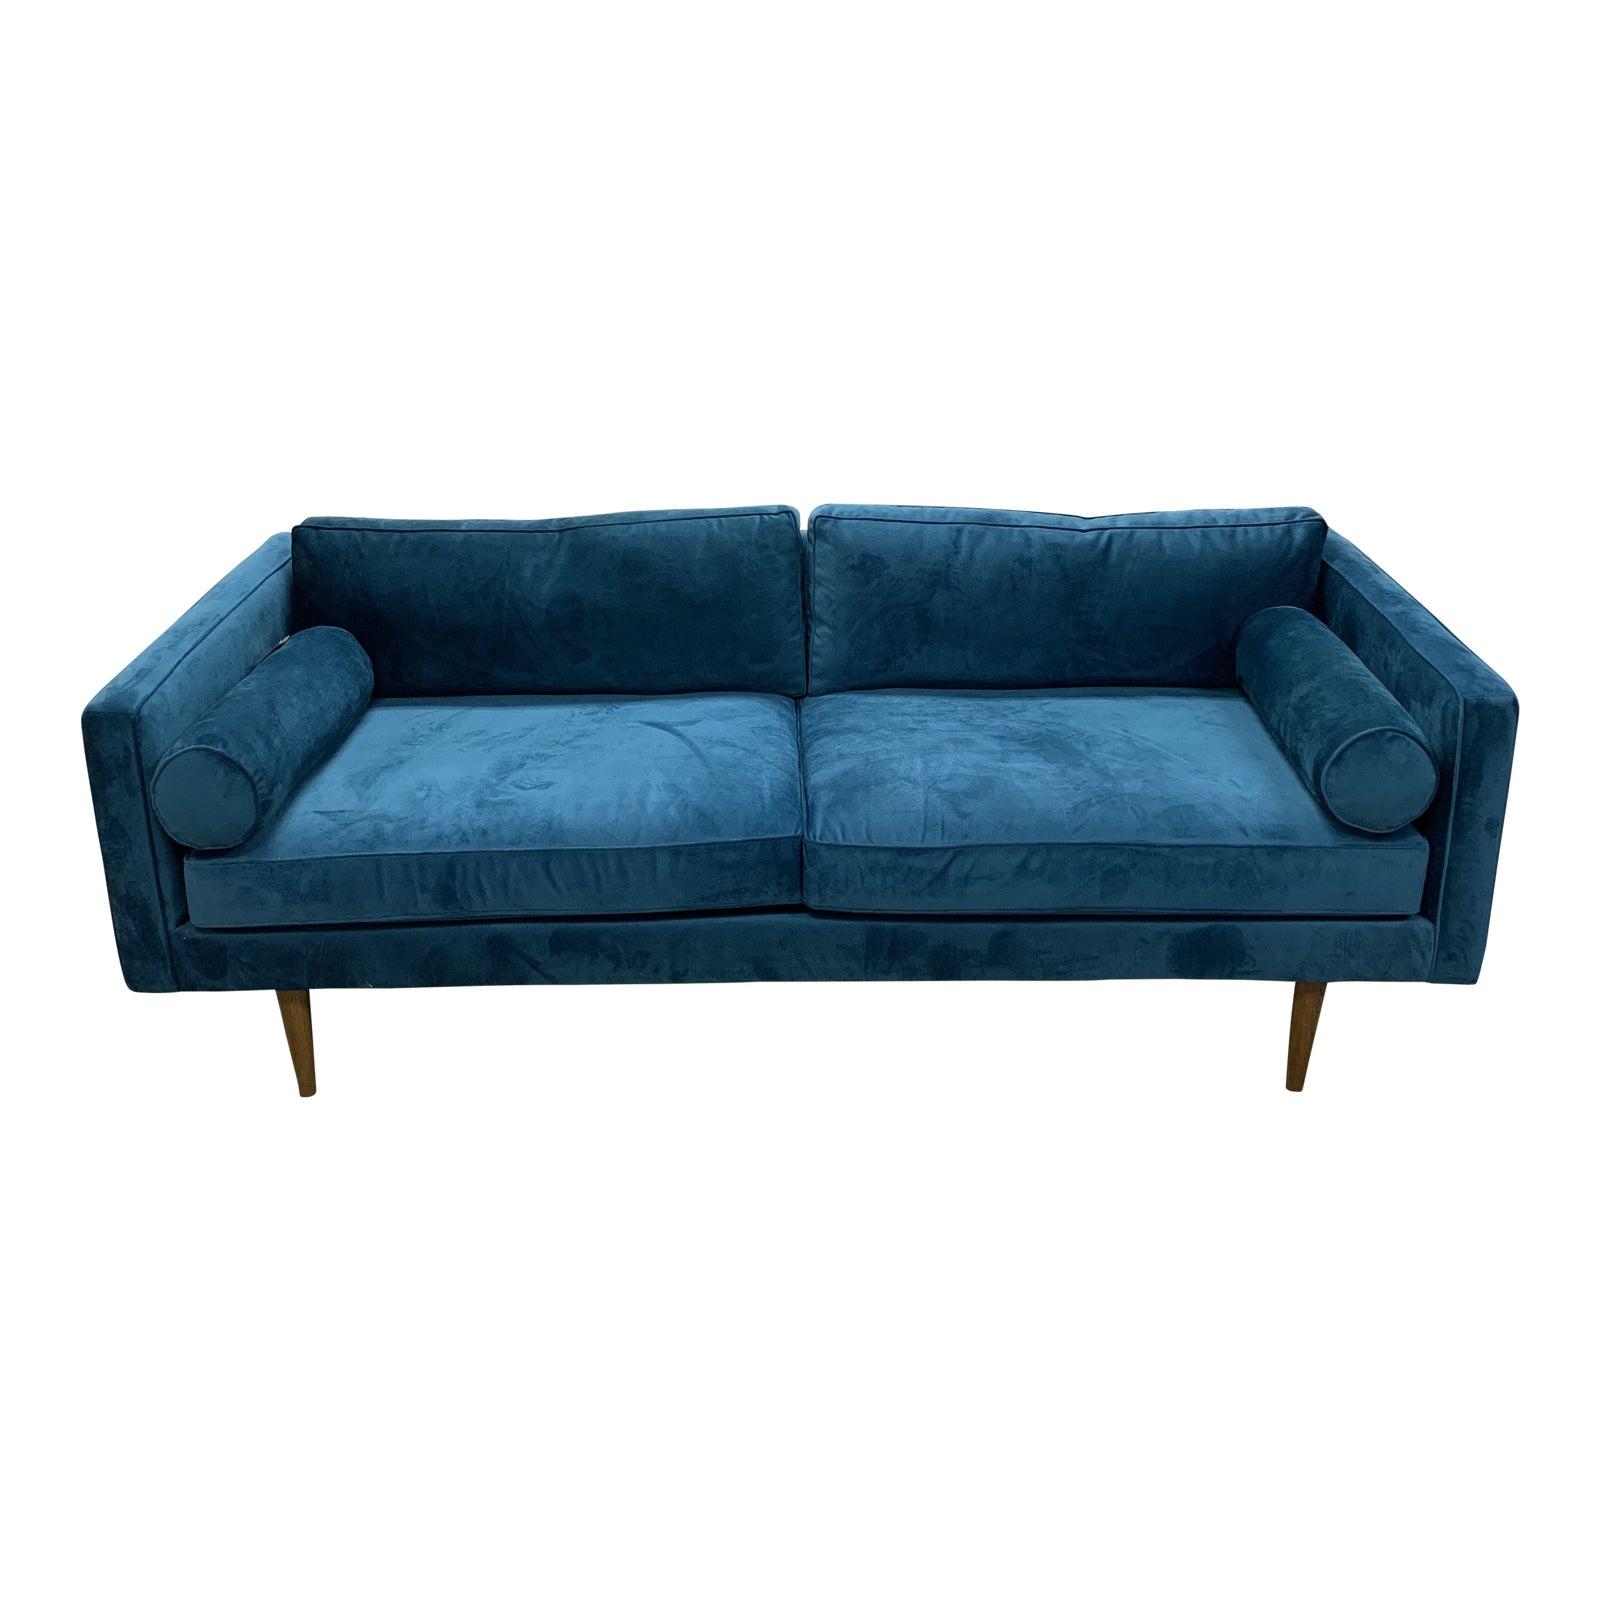 Astonishing Modern West Elm Mid Century Style Teal Velvet Sofa Ocoug Best Dining Table And Chair Ideas Images Ocougorg